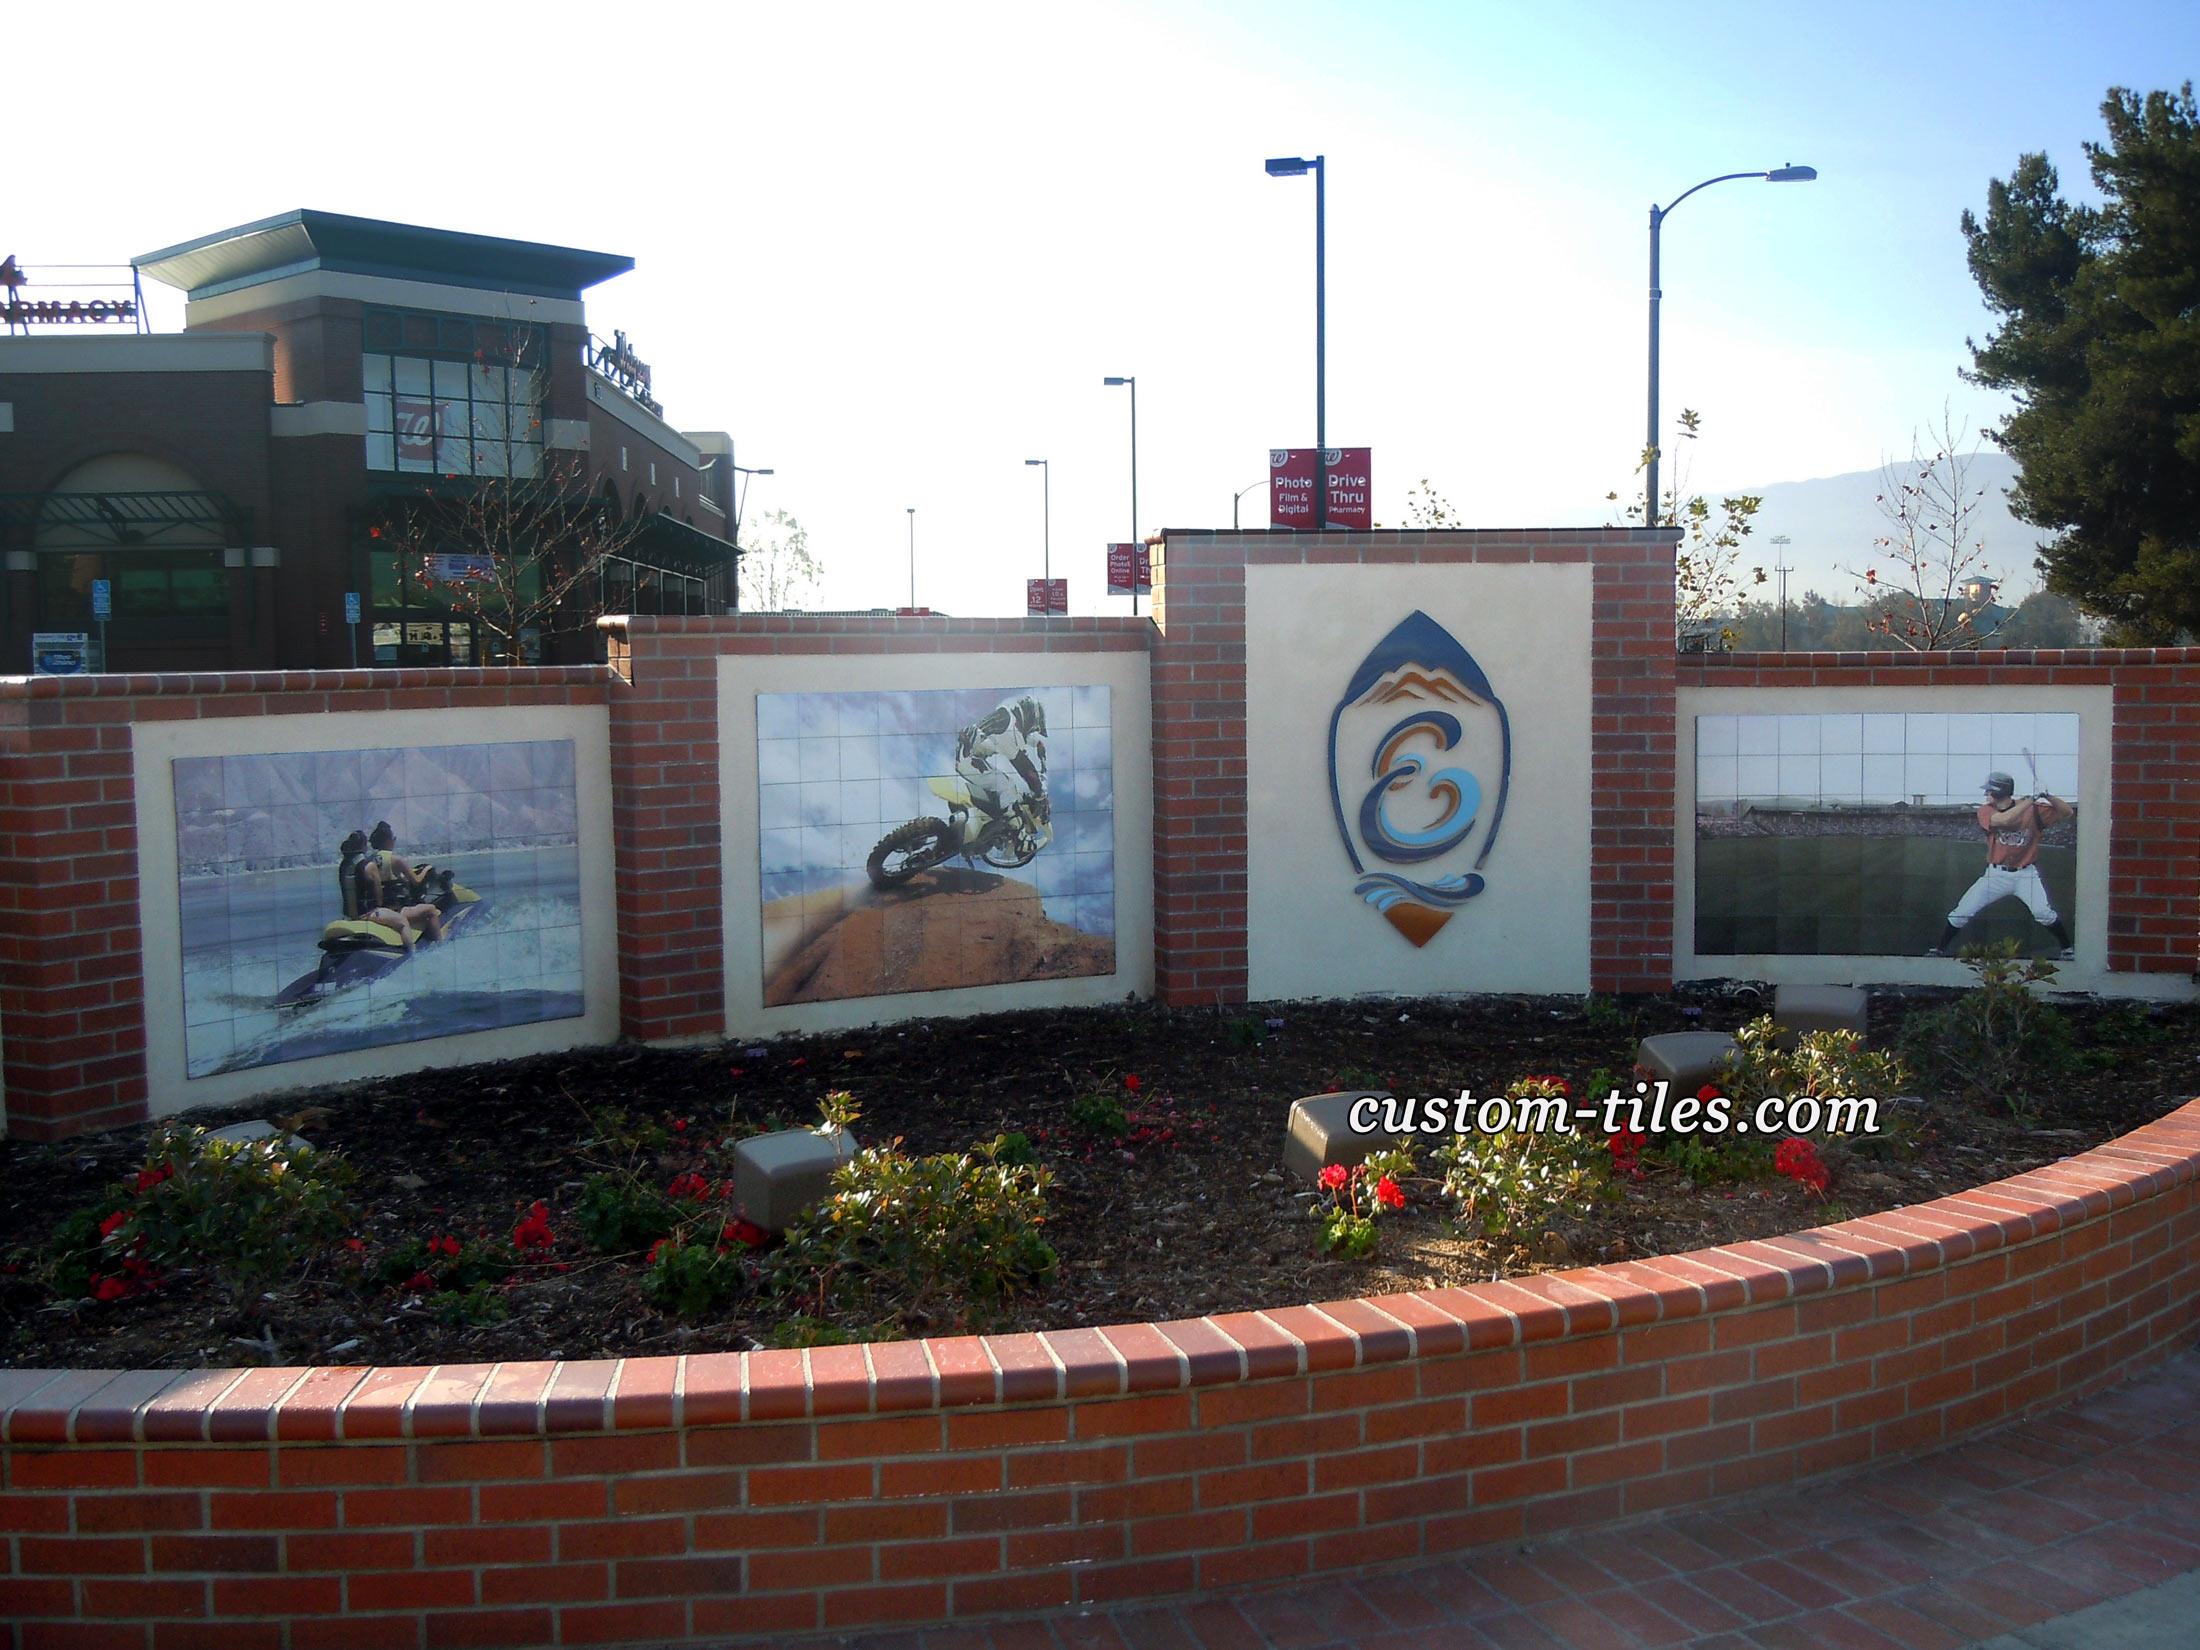 custom tiles and tile mural pictures custom tile murals outdoor tile murals fade resistant